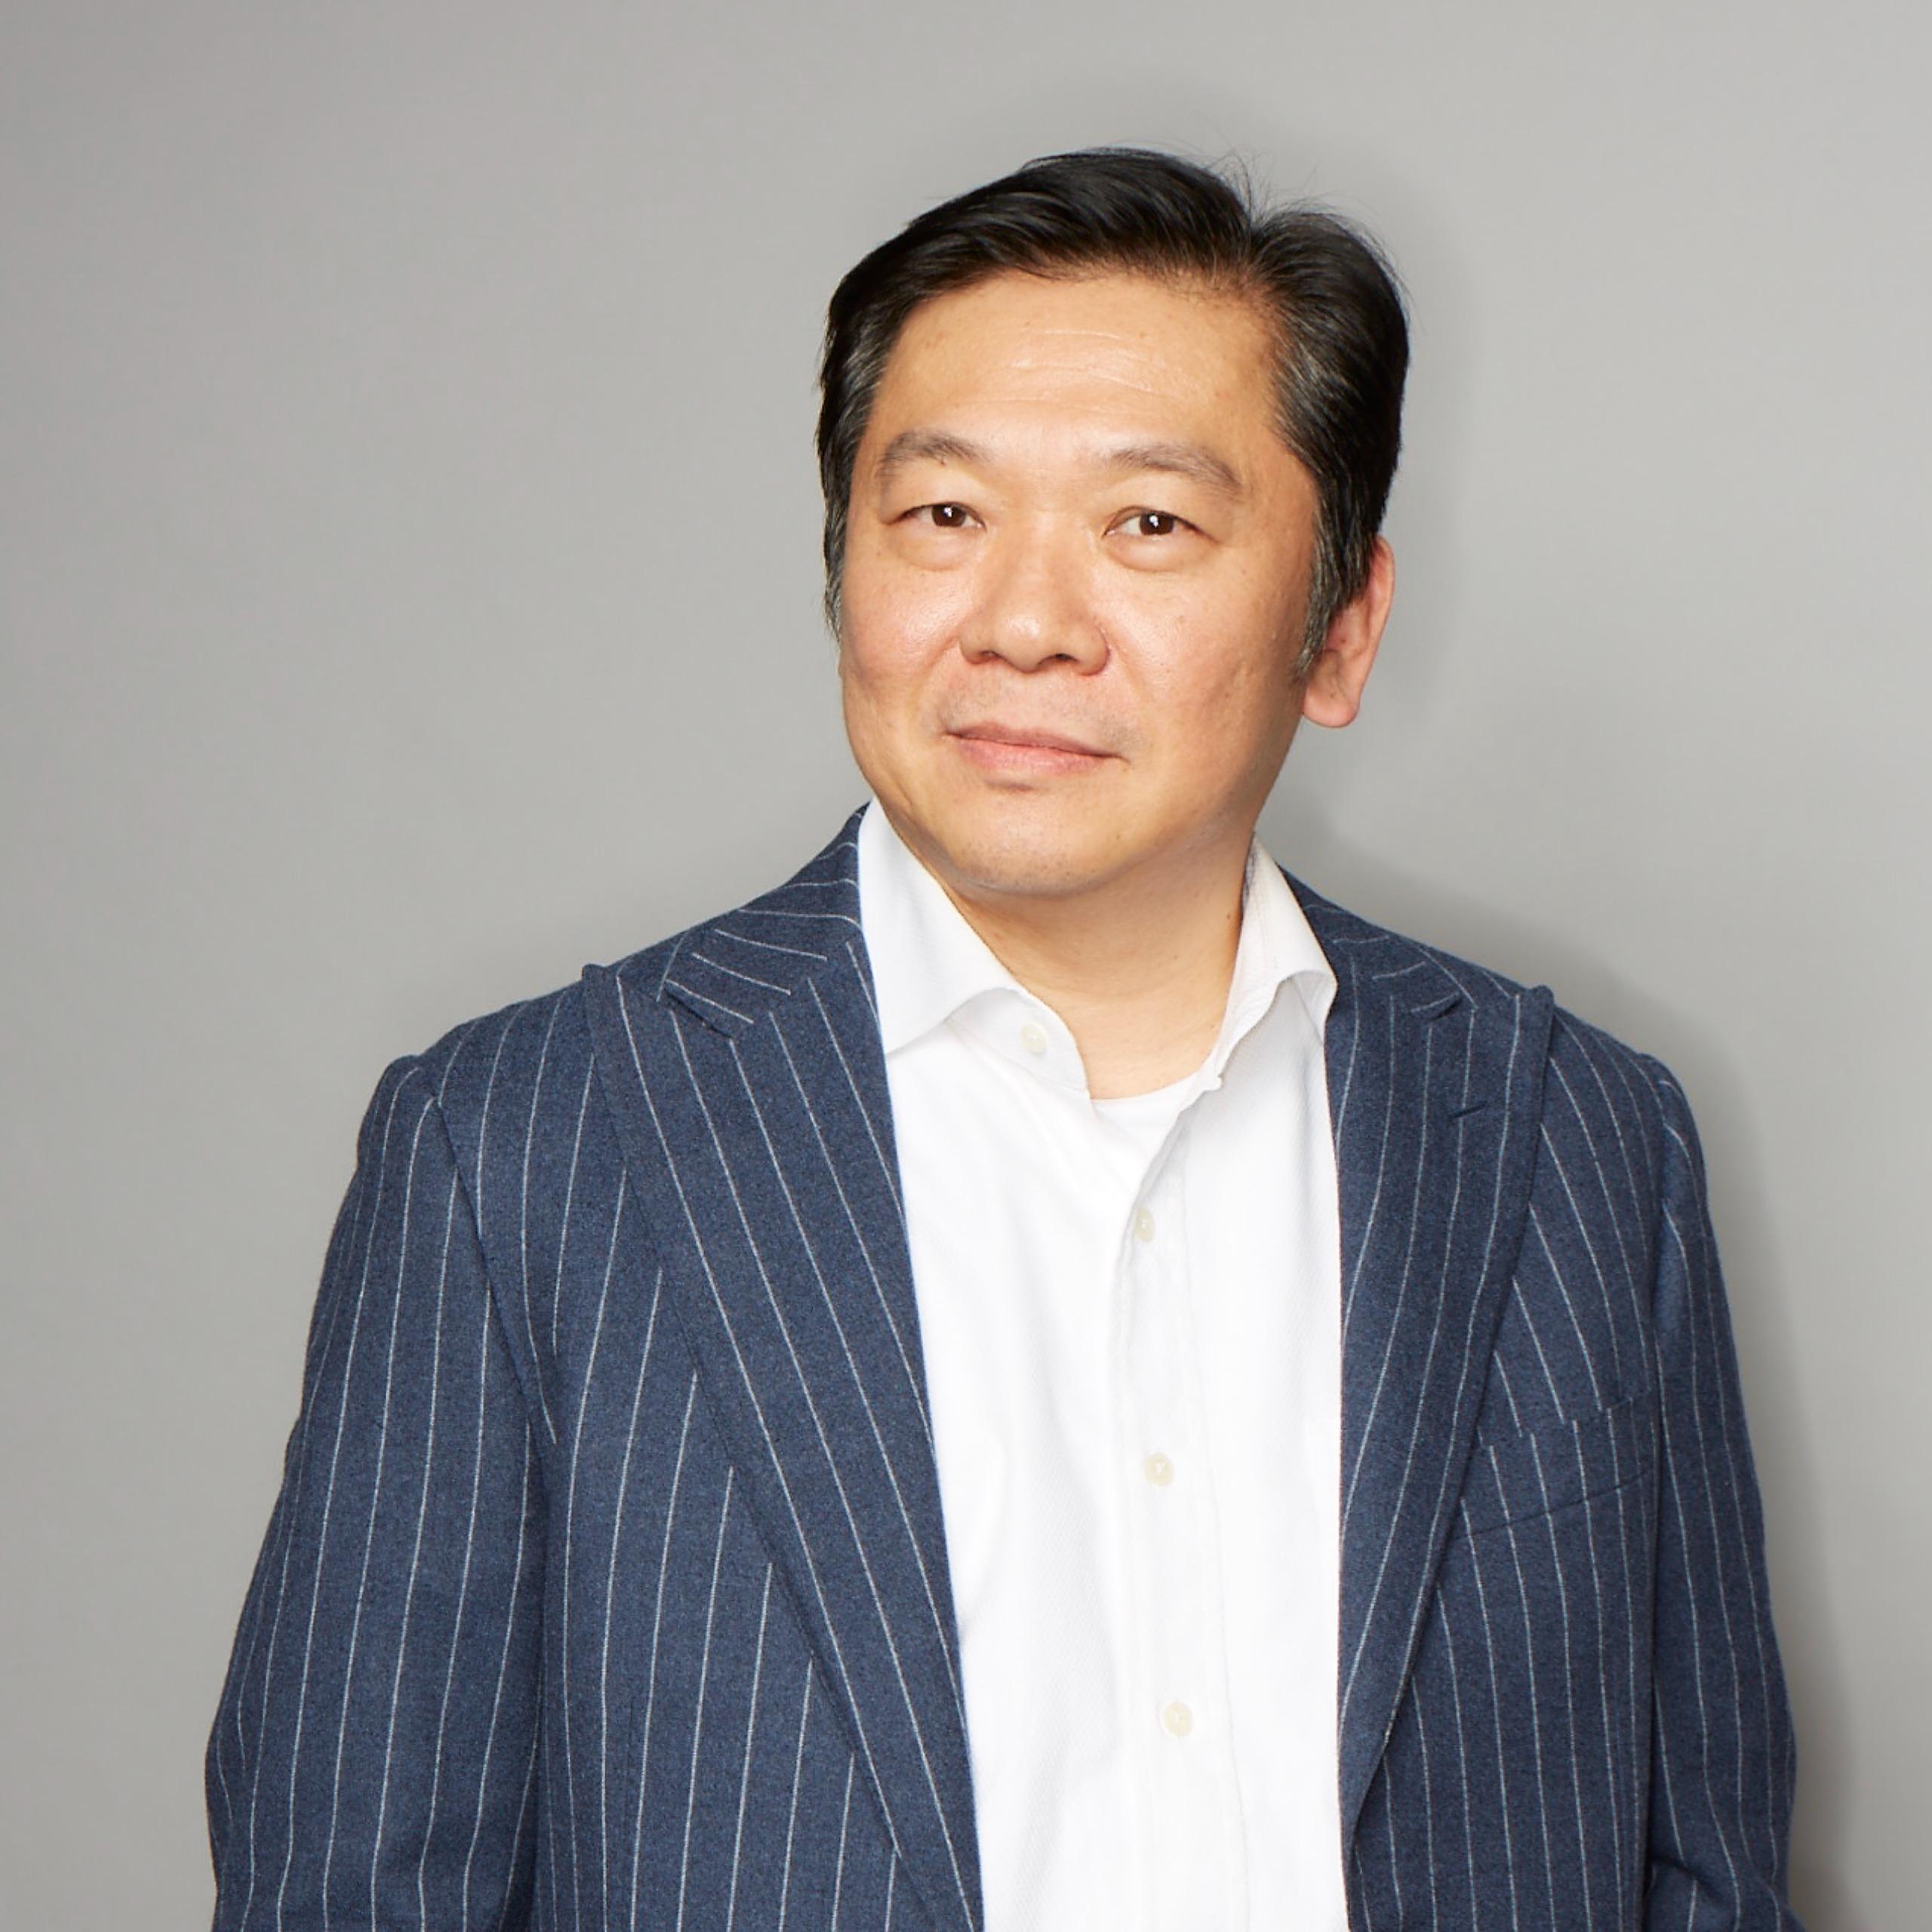 Johnson Chng